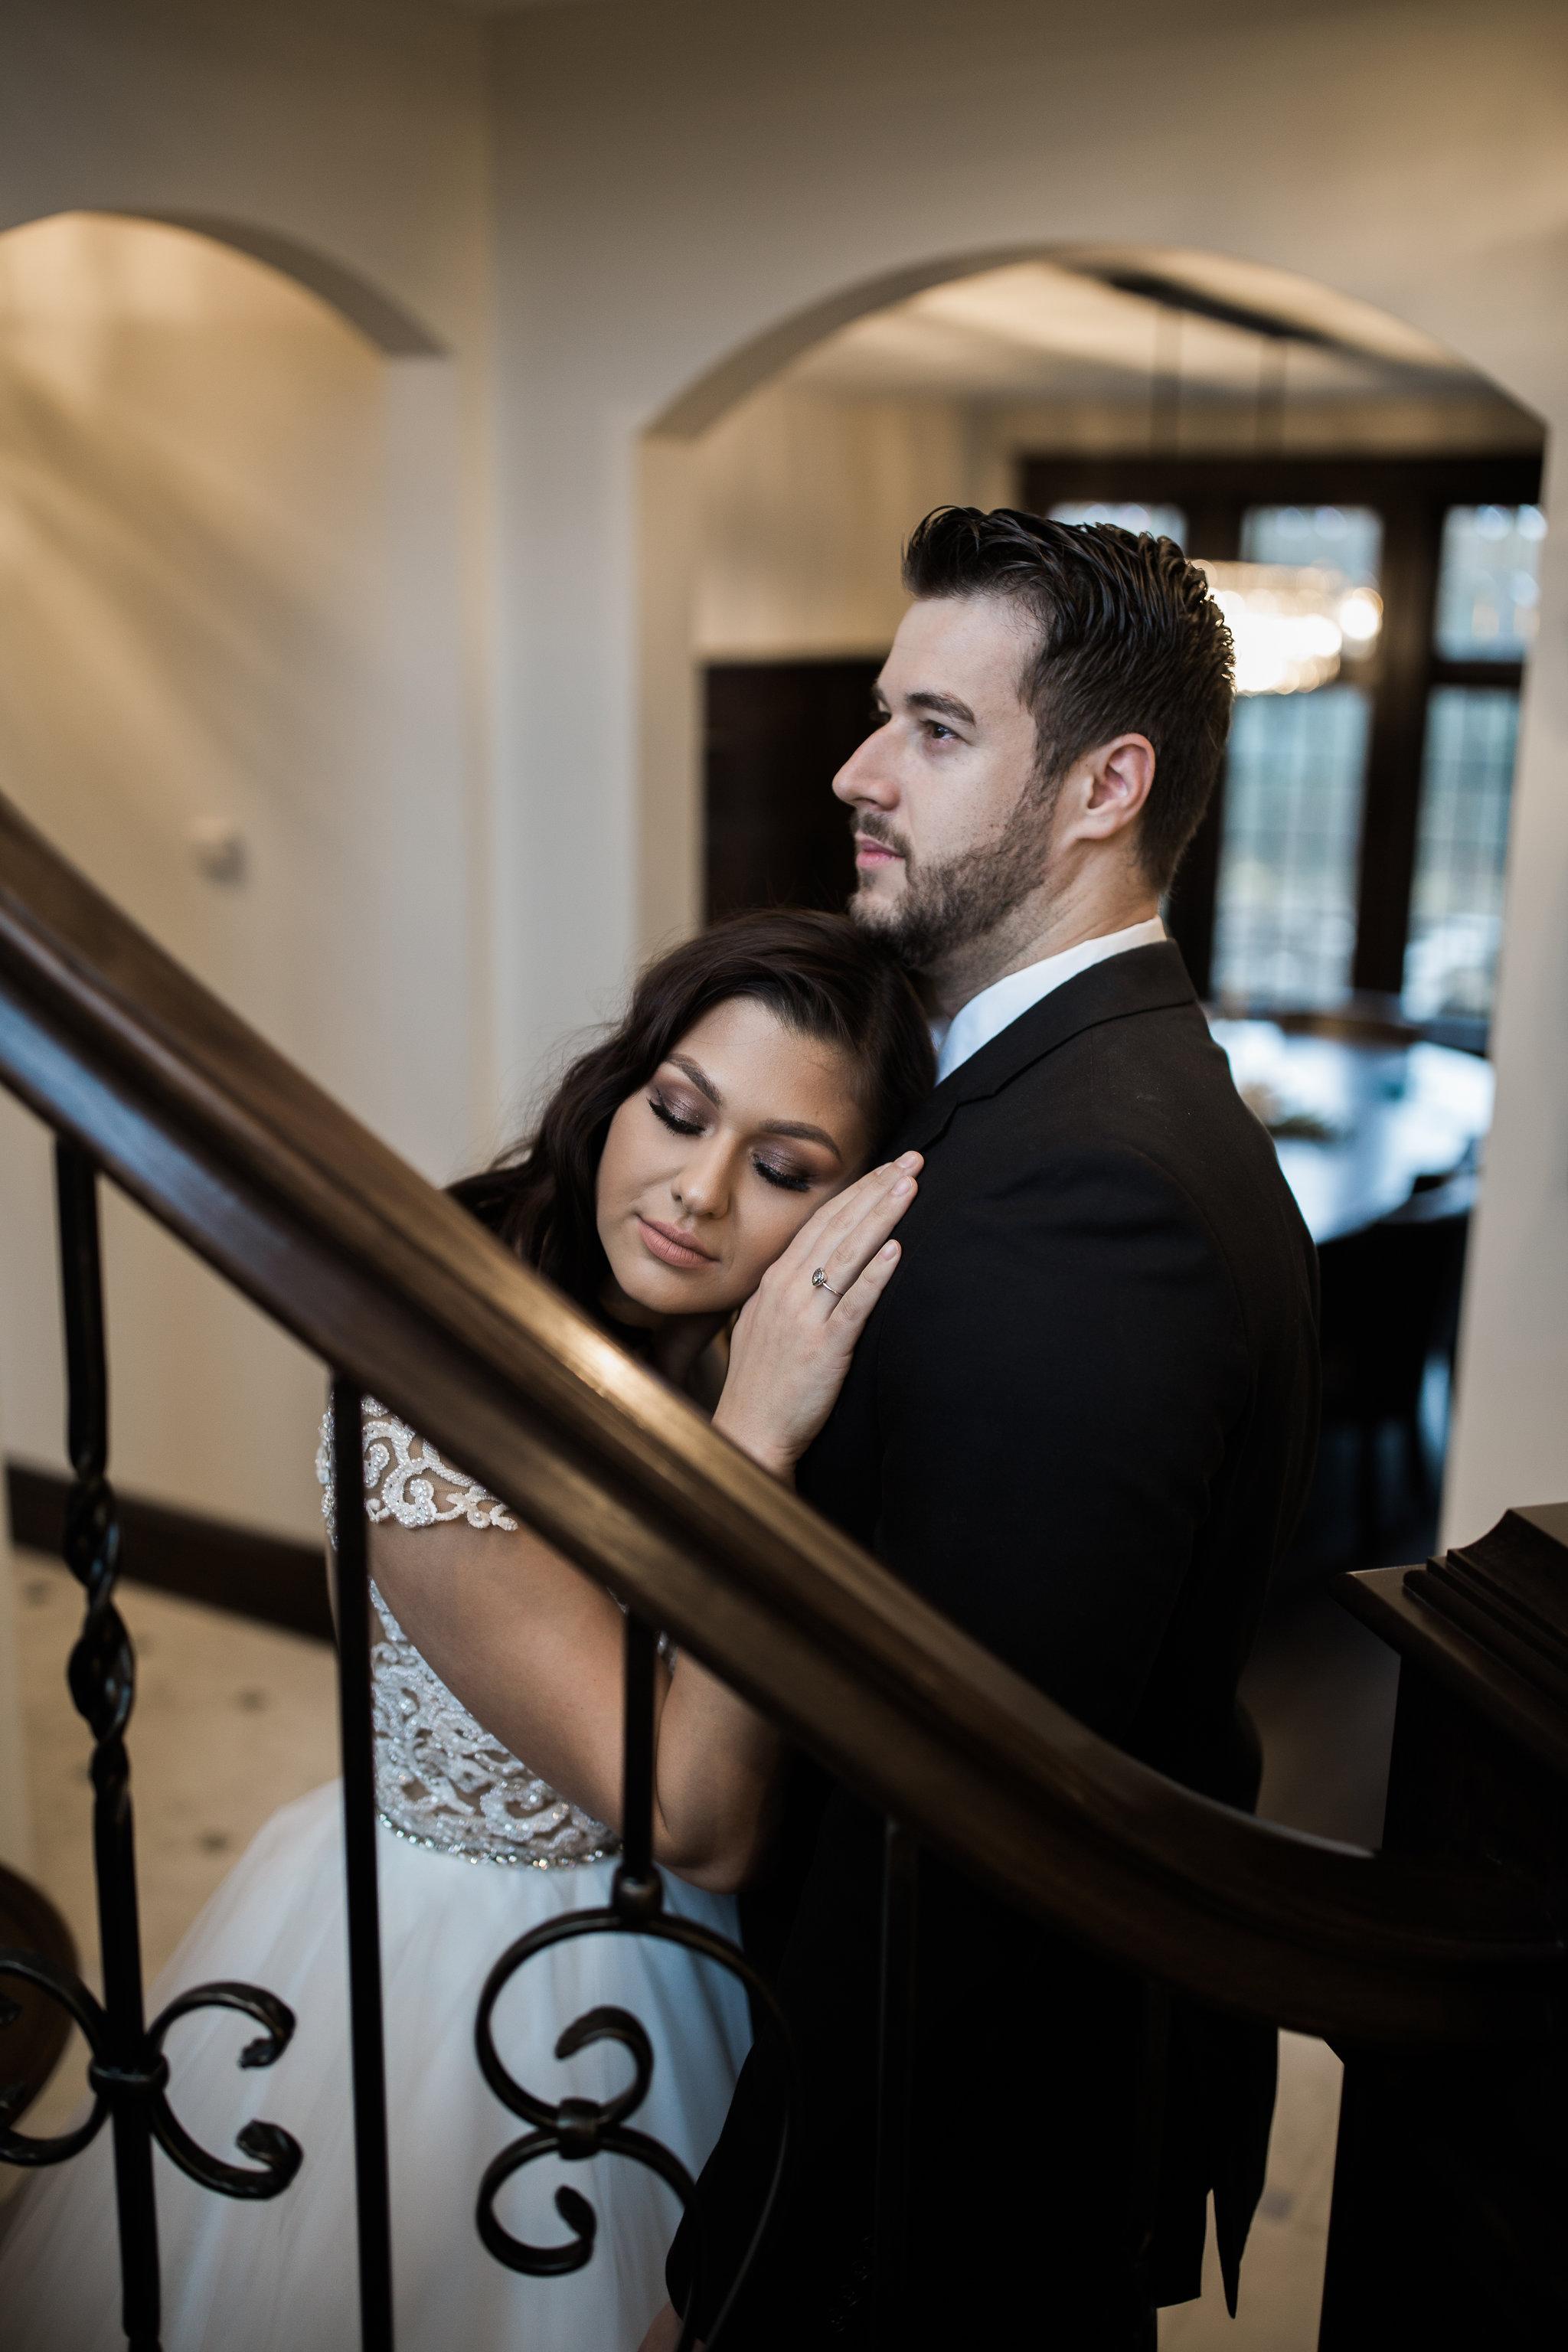 Photo: Kiss Me Kate Photography, Venue: Venue3Two, Hair: Cassandra Hinojosa, Dress: Memories Bridal